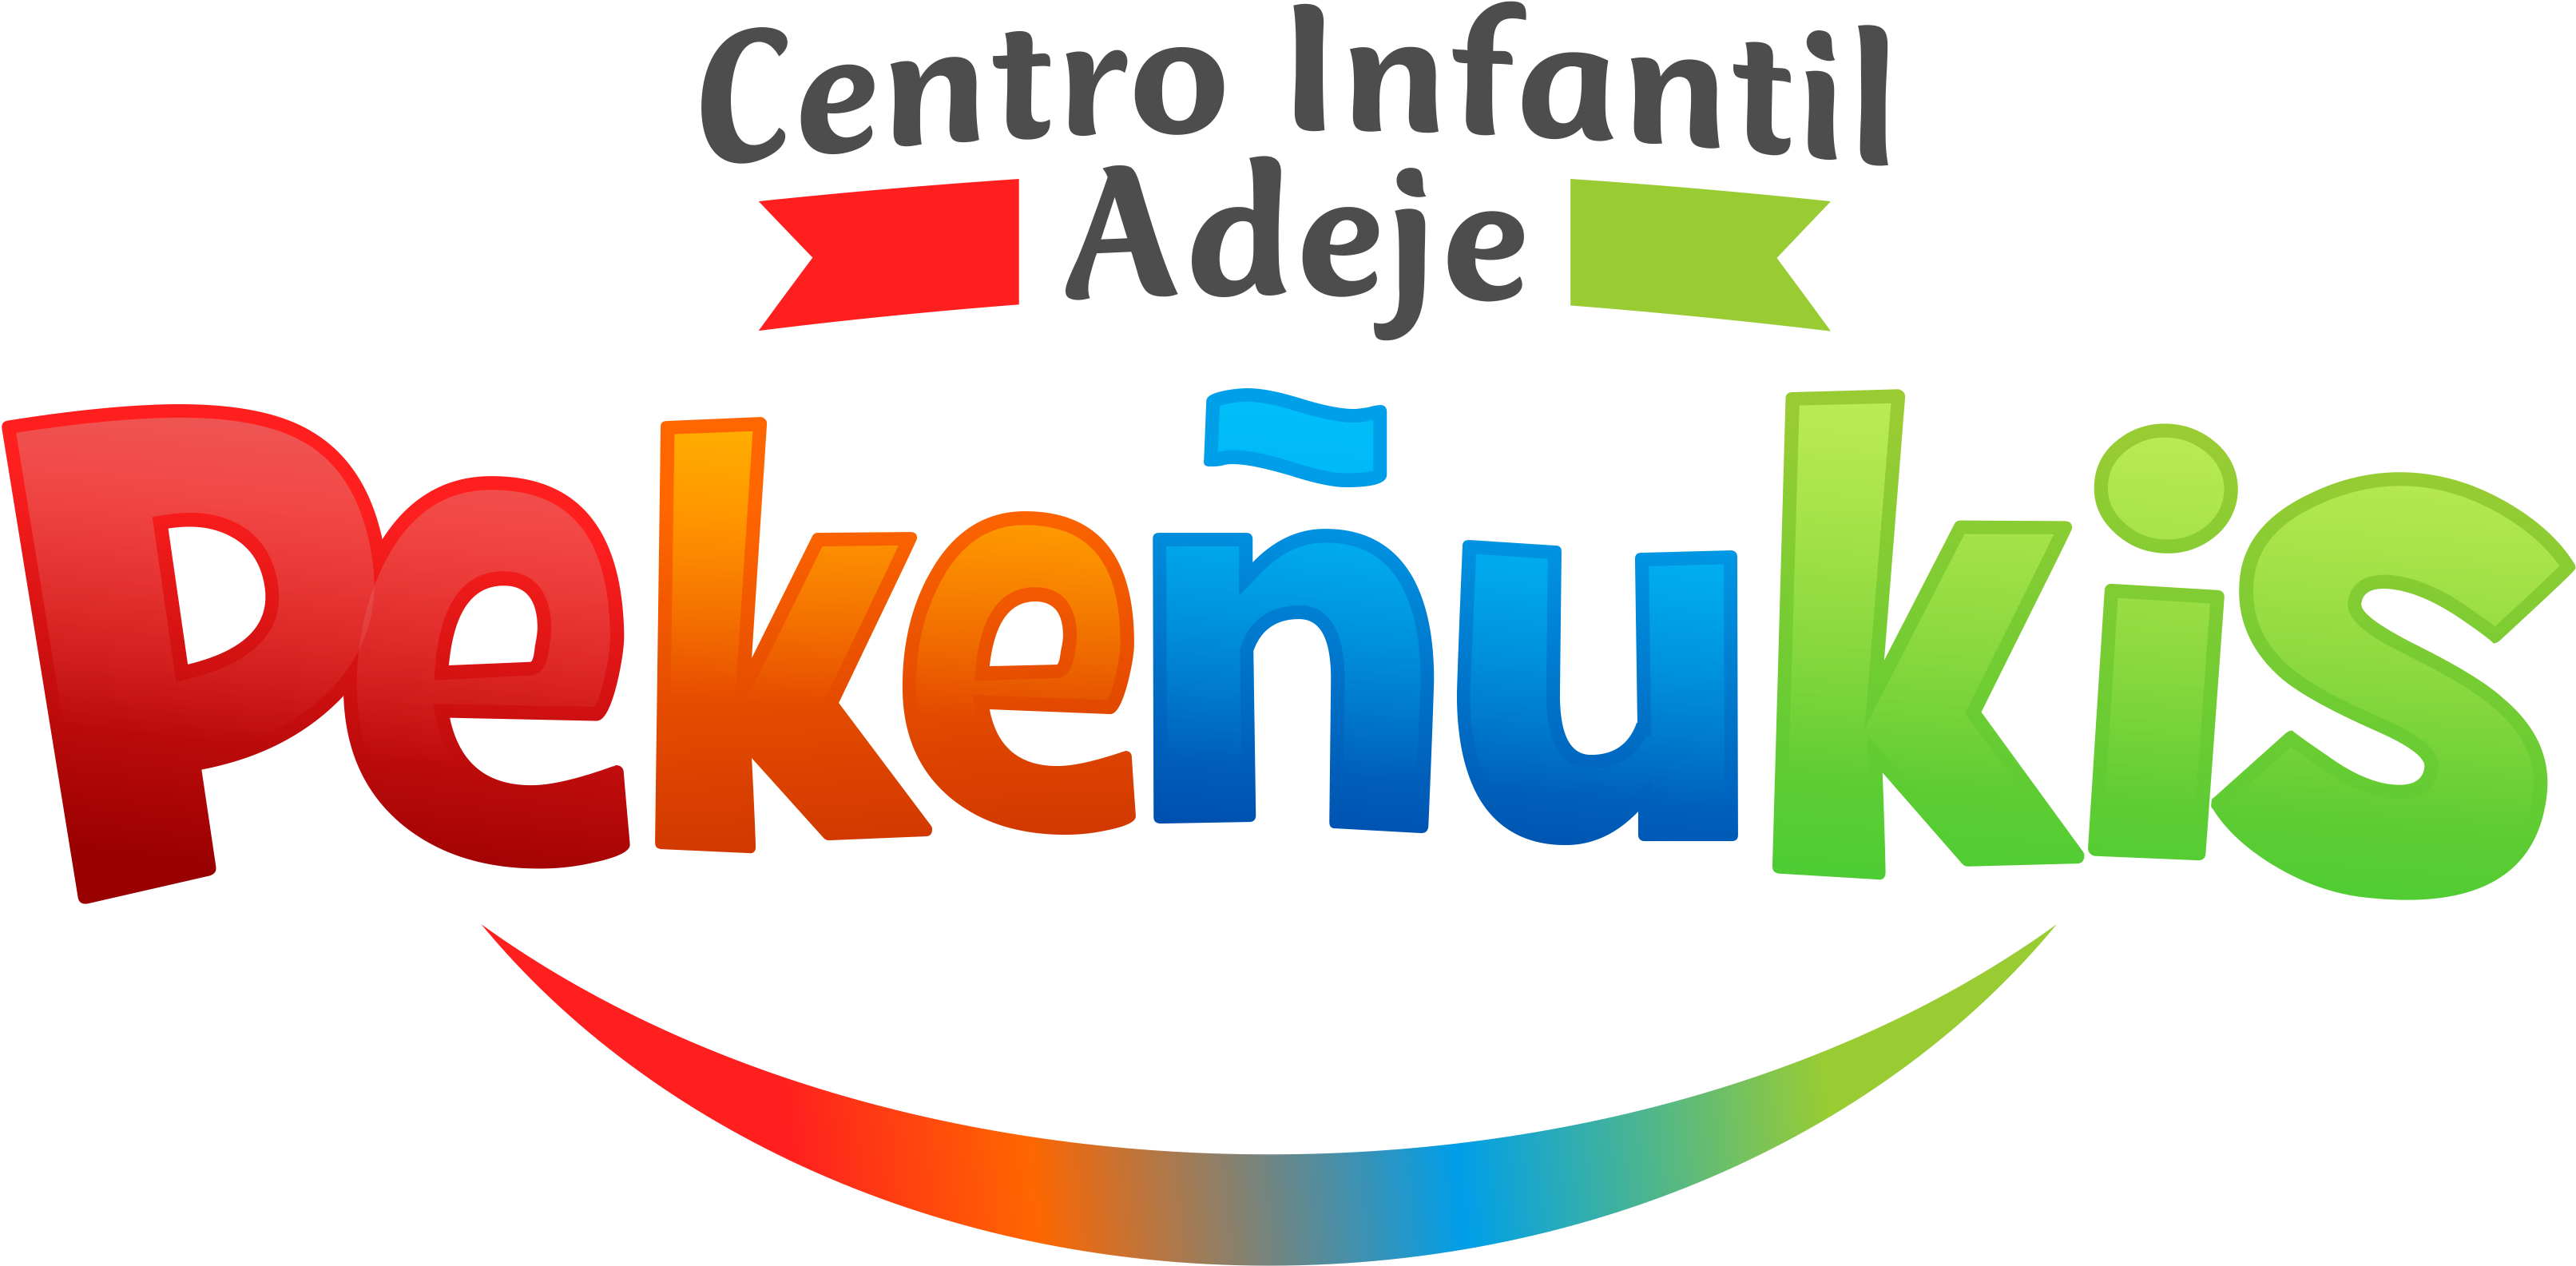 Centro Infantil Pekeñukis